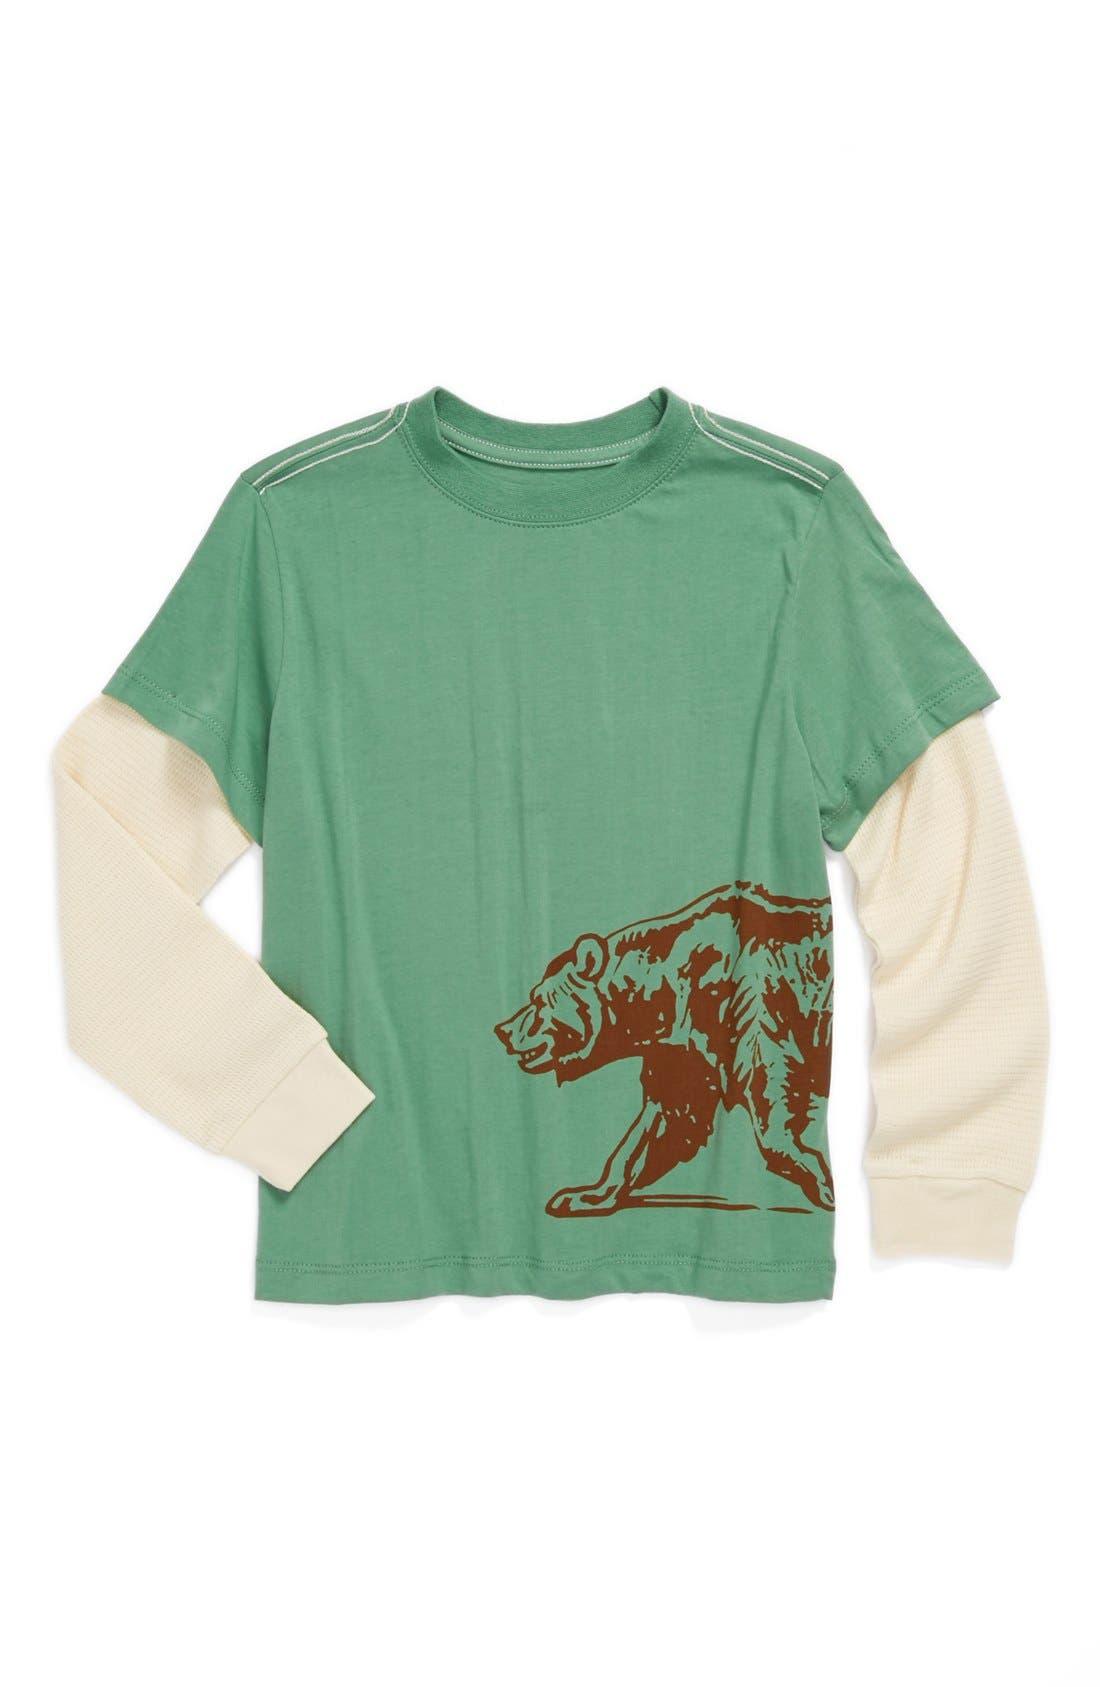 Alternate Image 1 Selected - Peek 'Bear' T-Shirt (Toddler Boys, Little Boys & Big Boys)